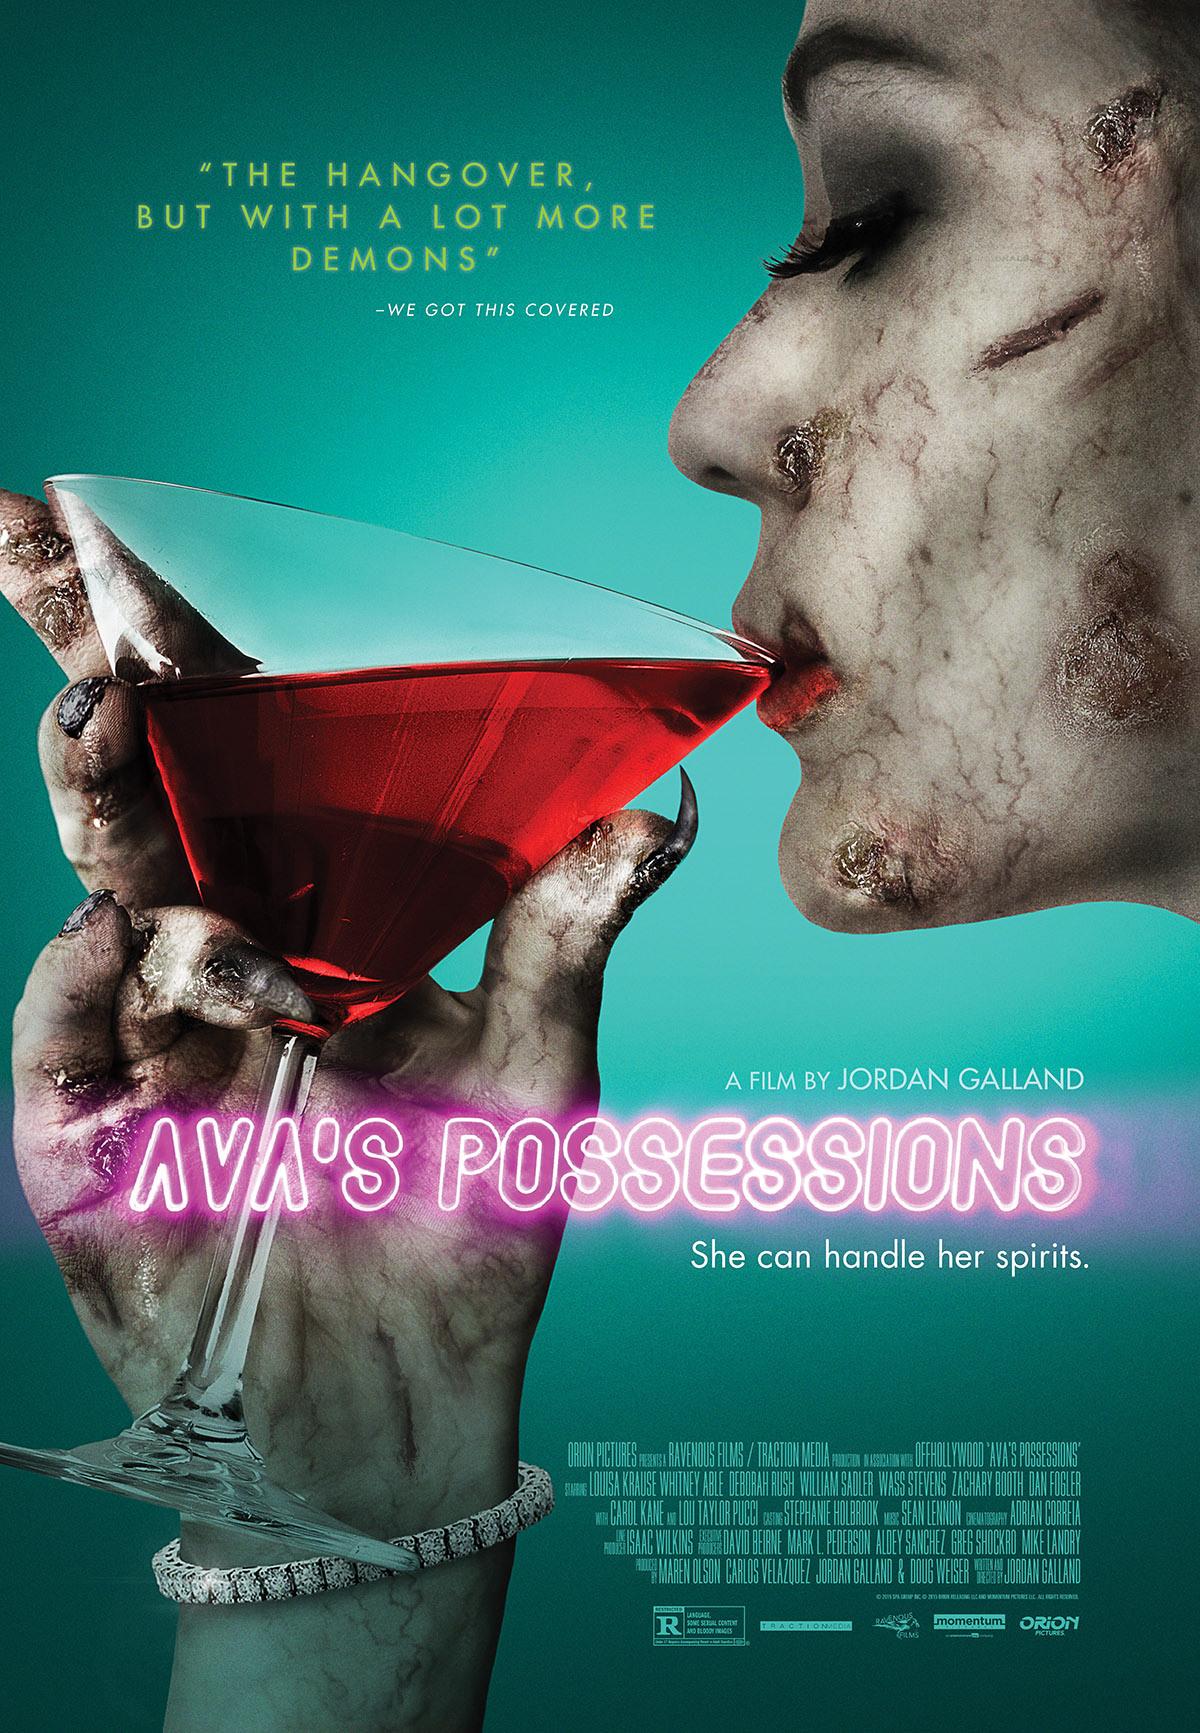 avas-possessions-poster.jpg